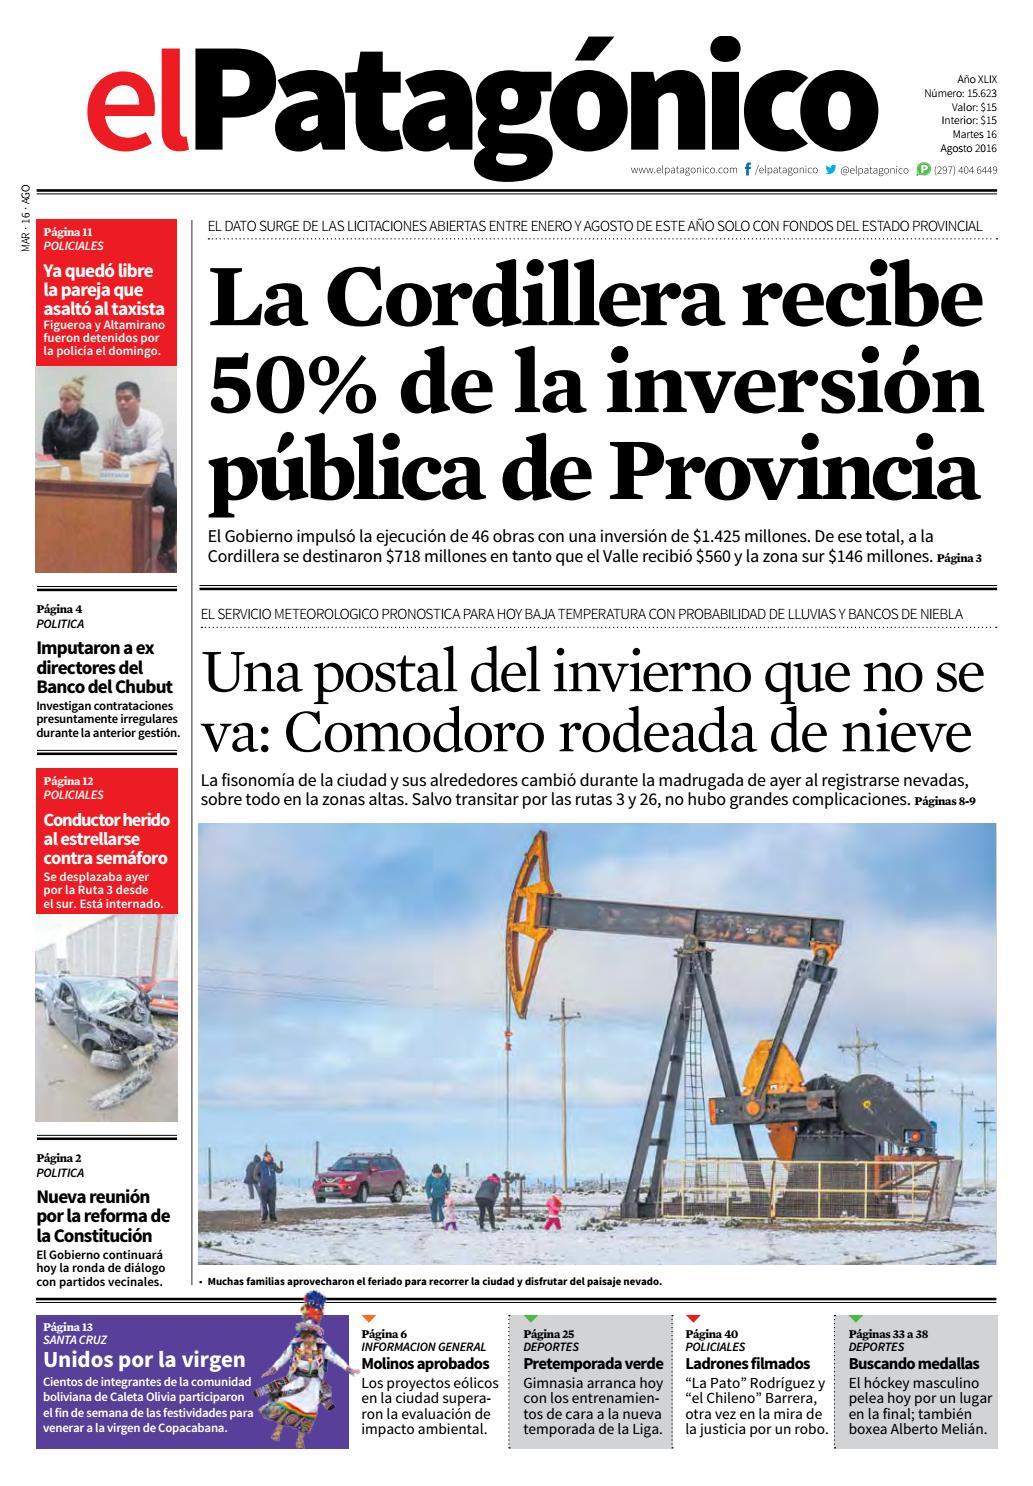 edicion225815082016.pdf by El Patagonico - issuu